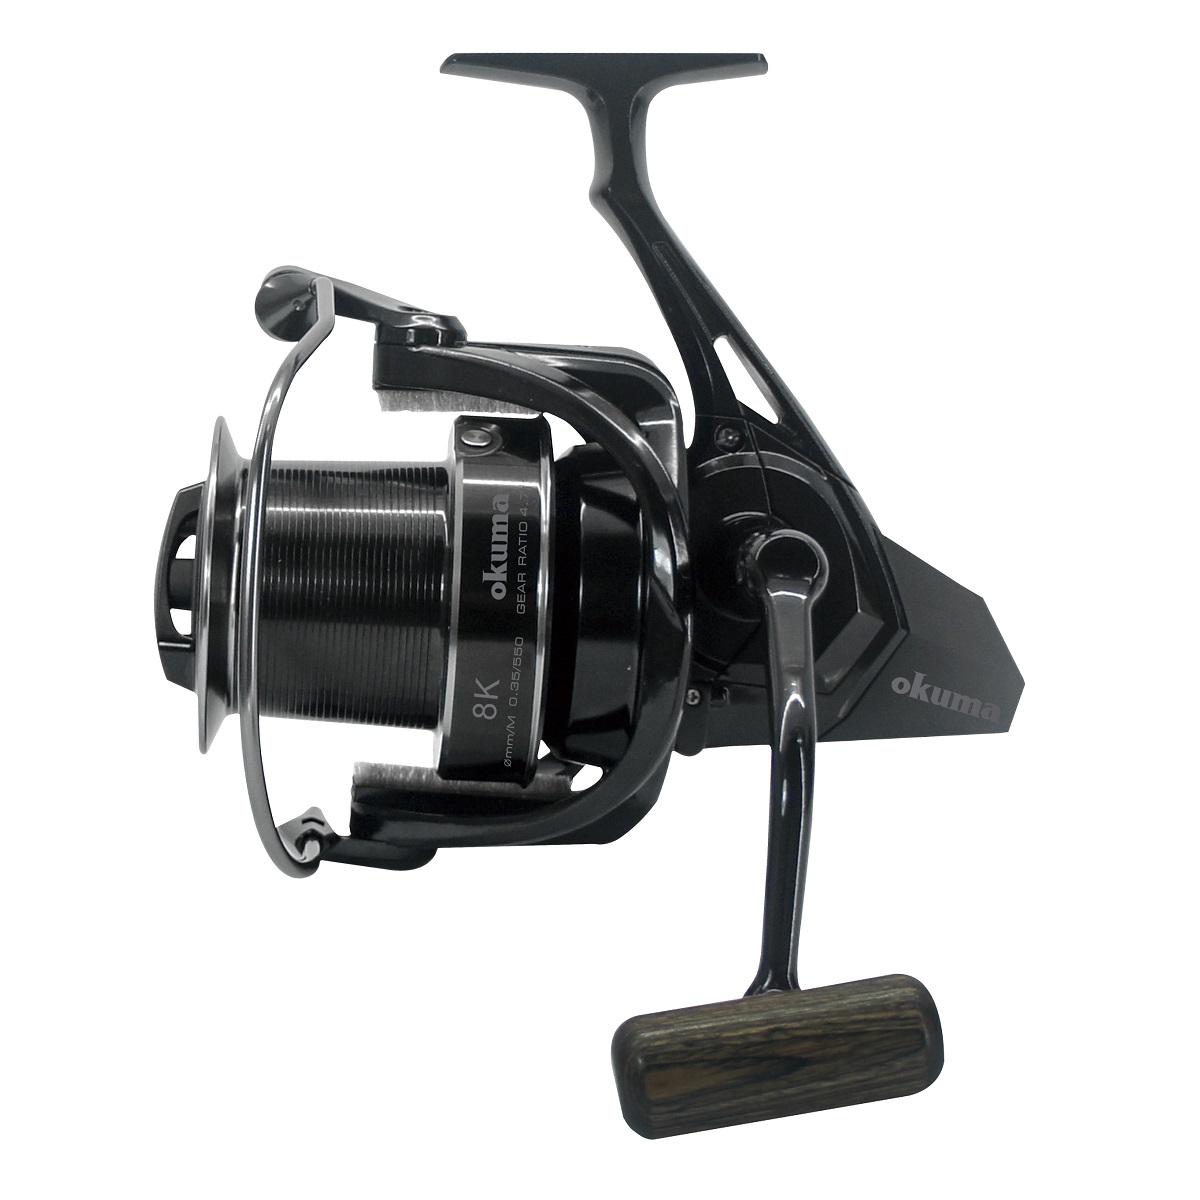 8k Spinning Reel Okuma Fishing Rods And Reels Okuma Fishing Tackle Co Ltd